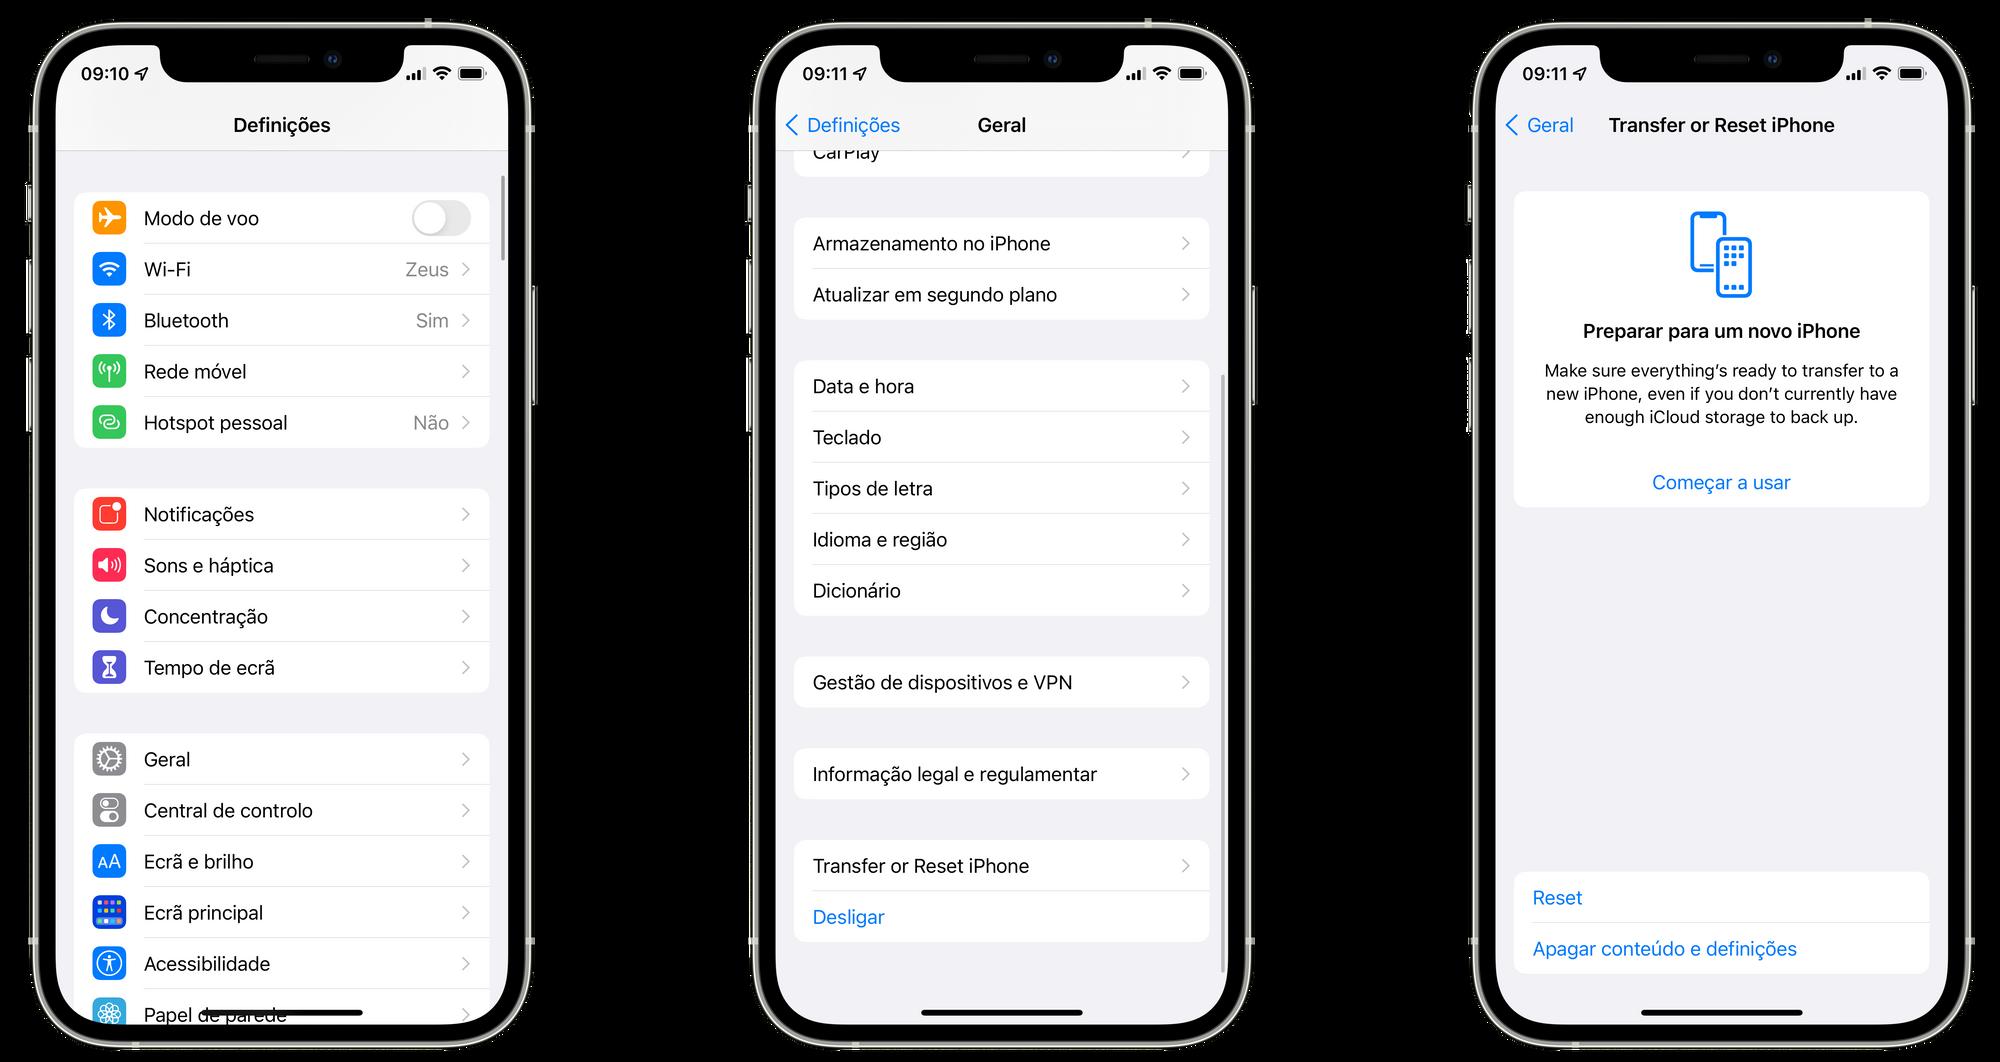 Transfer or Reset iPhone no iOS 15 beta 3